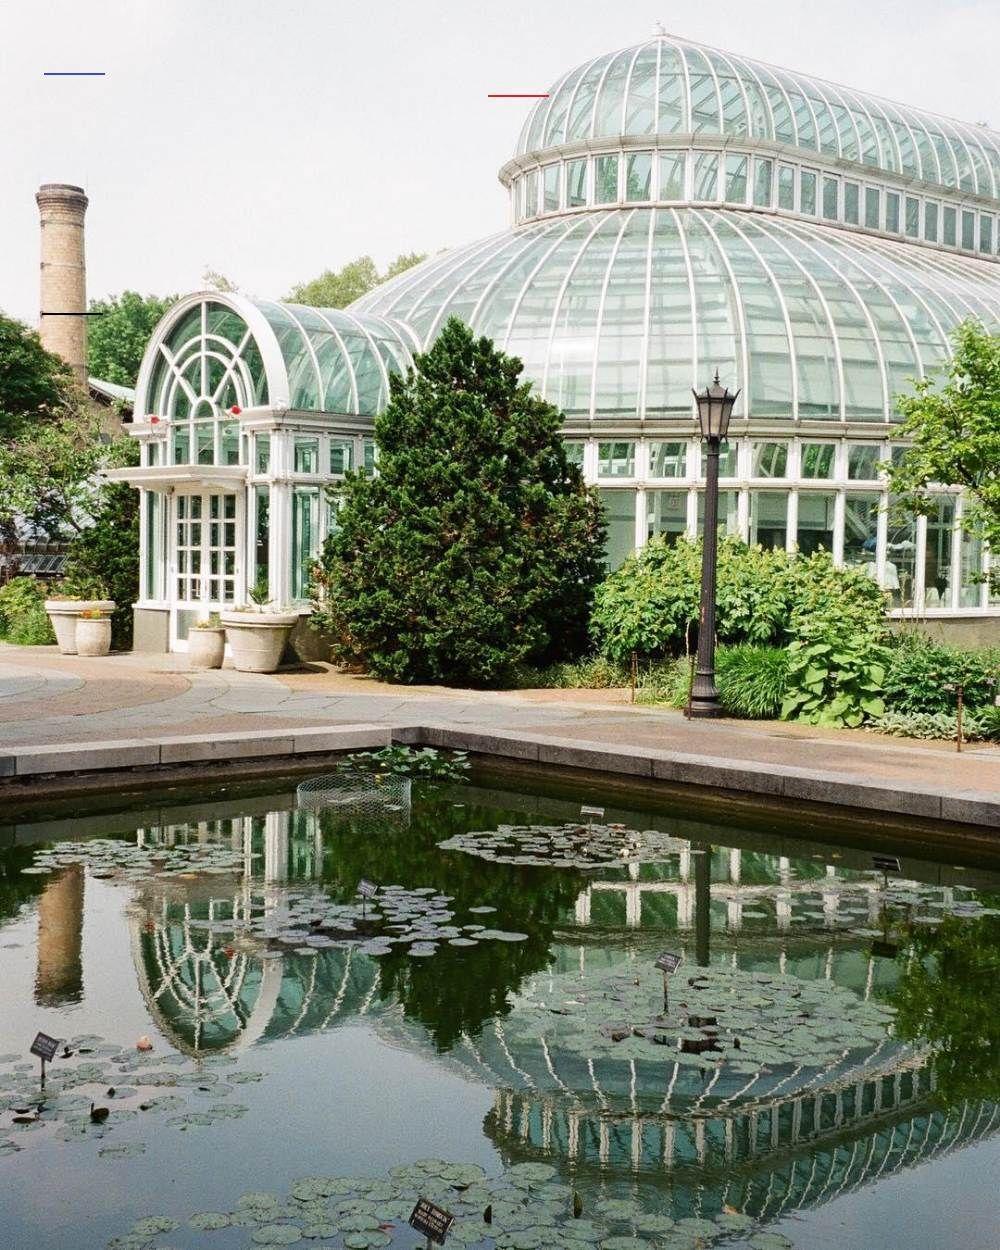 The Brooklyn City Guide 28 Spots To Stay Dine Experience Botanicgarden With The Best Street Ar Gartenarchitektur Gartendesign Ideen Botanischer Garten